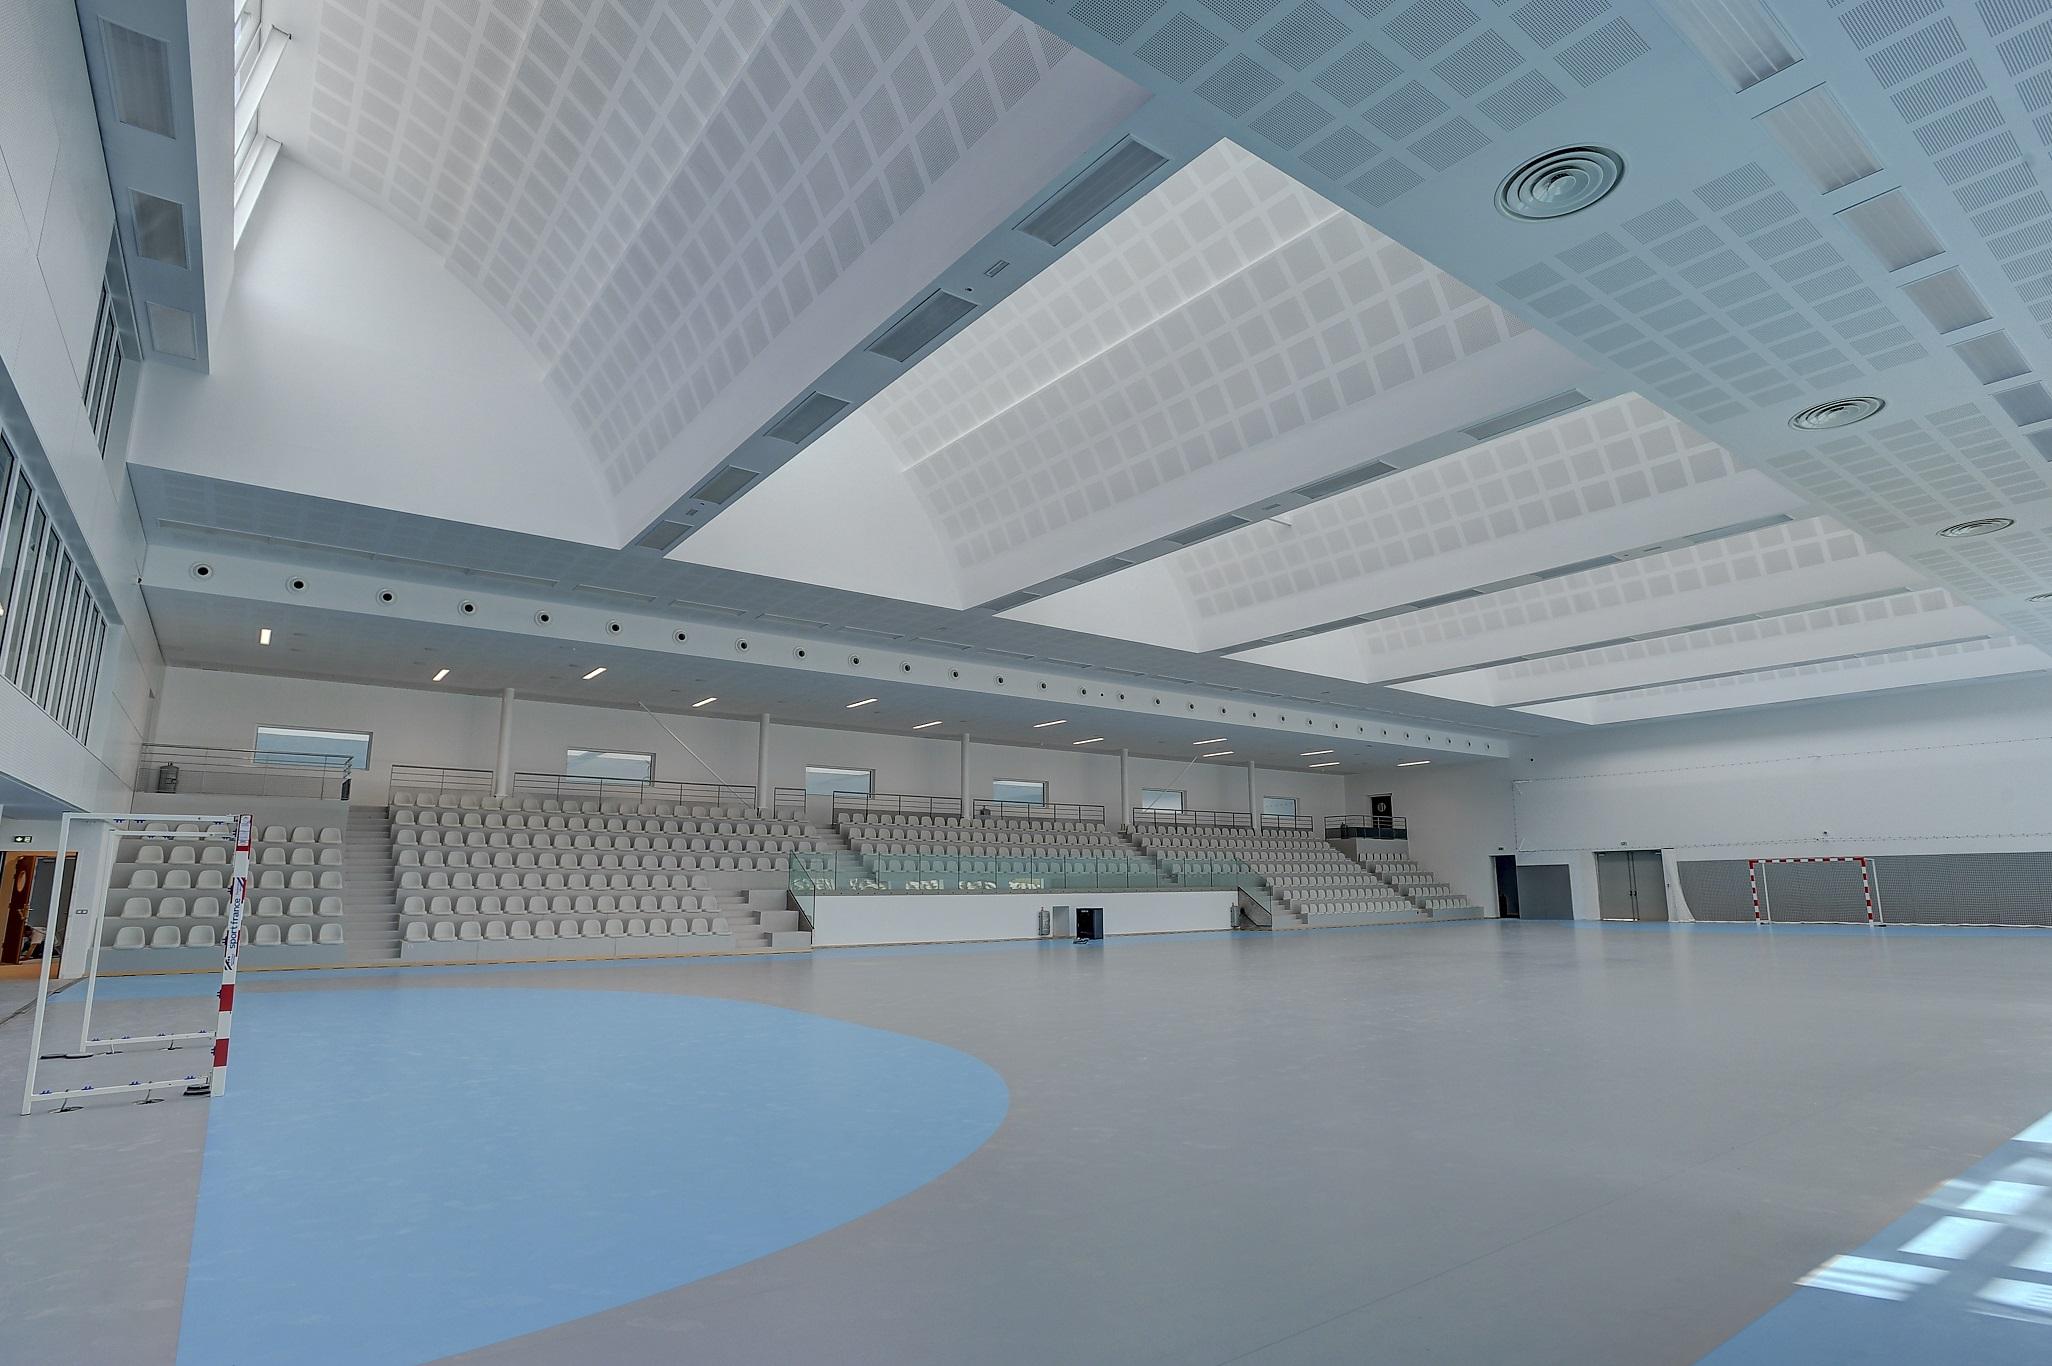 Maison du Handball Créteil